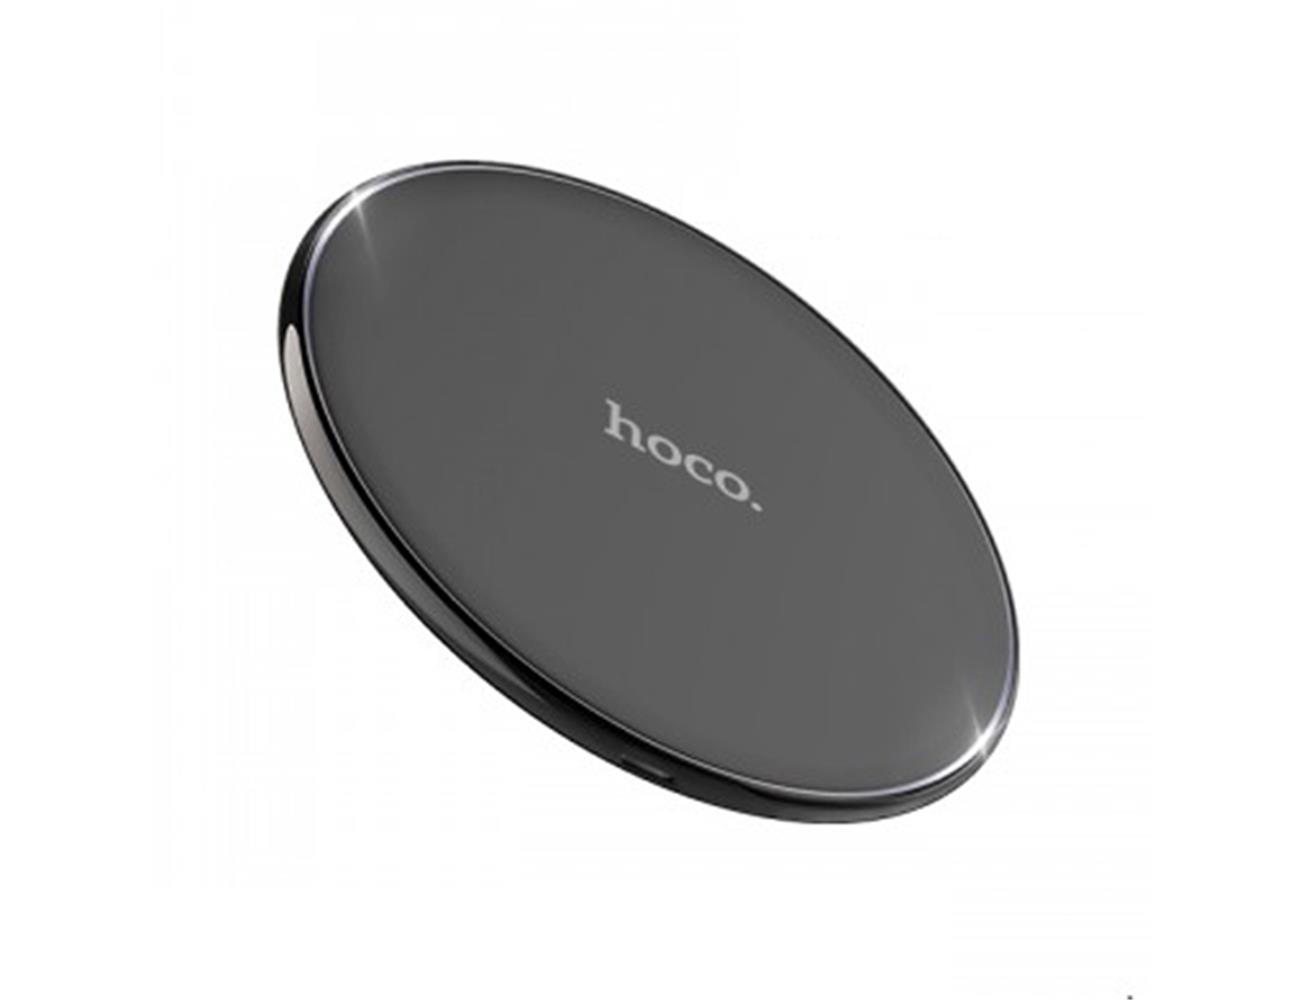 64c4aa94b37c68 Hoco CW6 Homey Wireless Charger - Black| Blink Kuwait